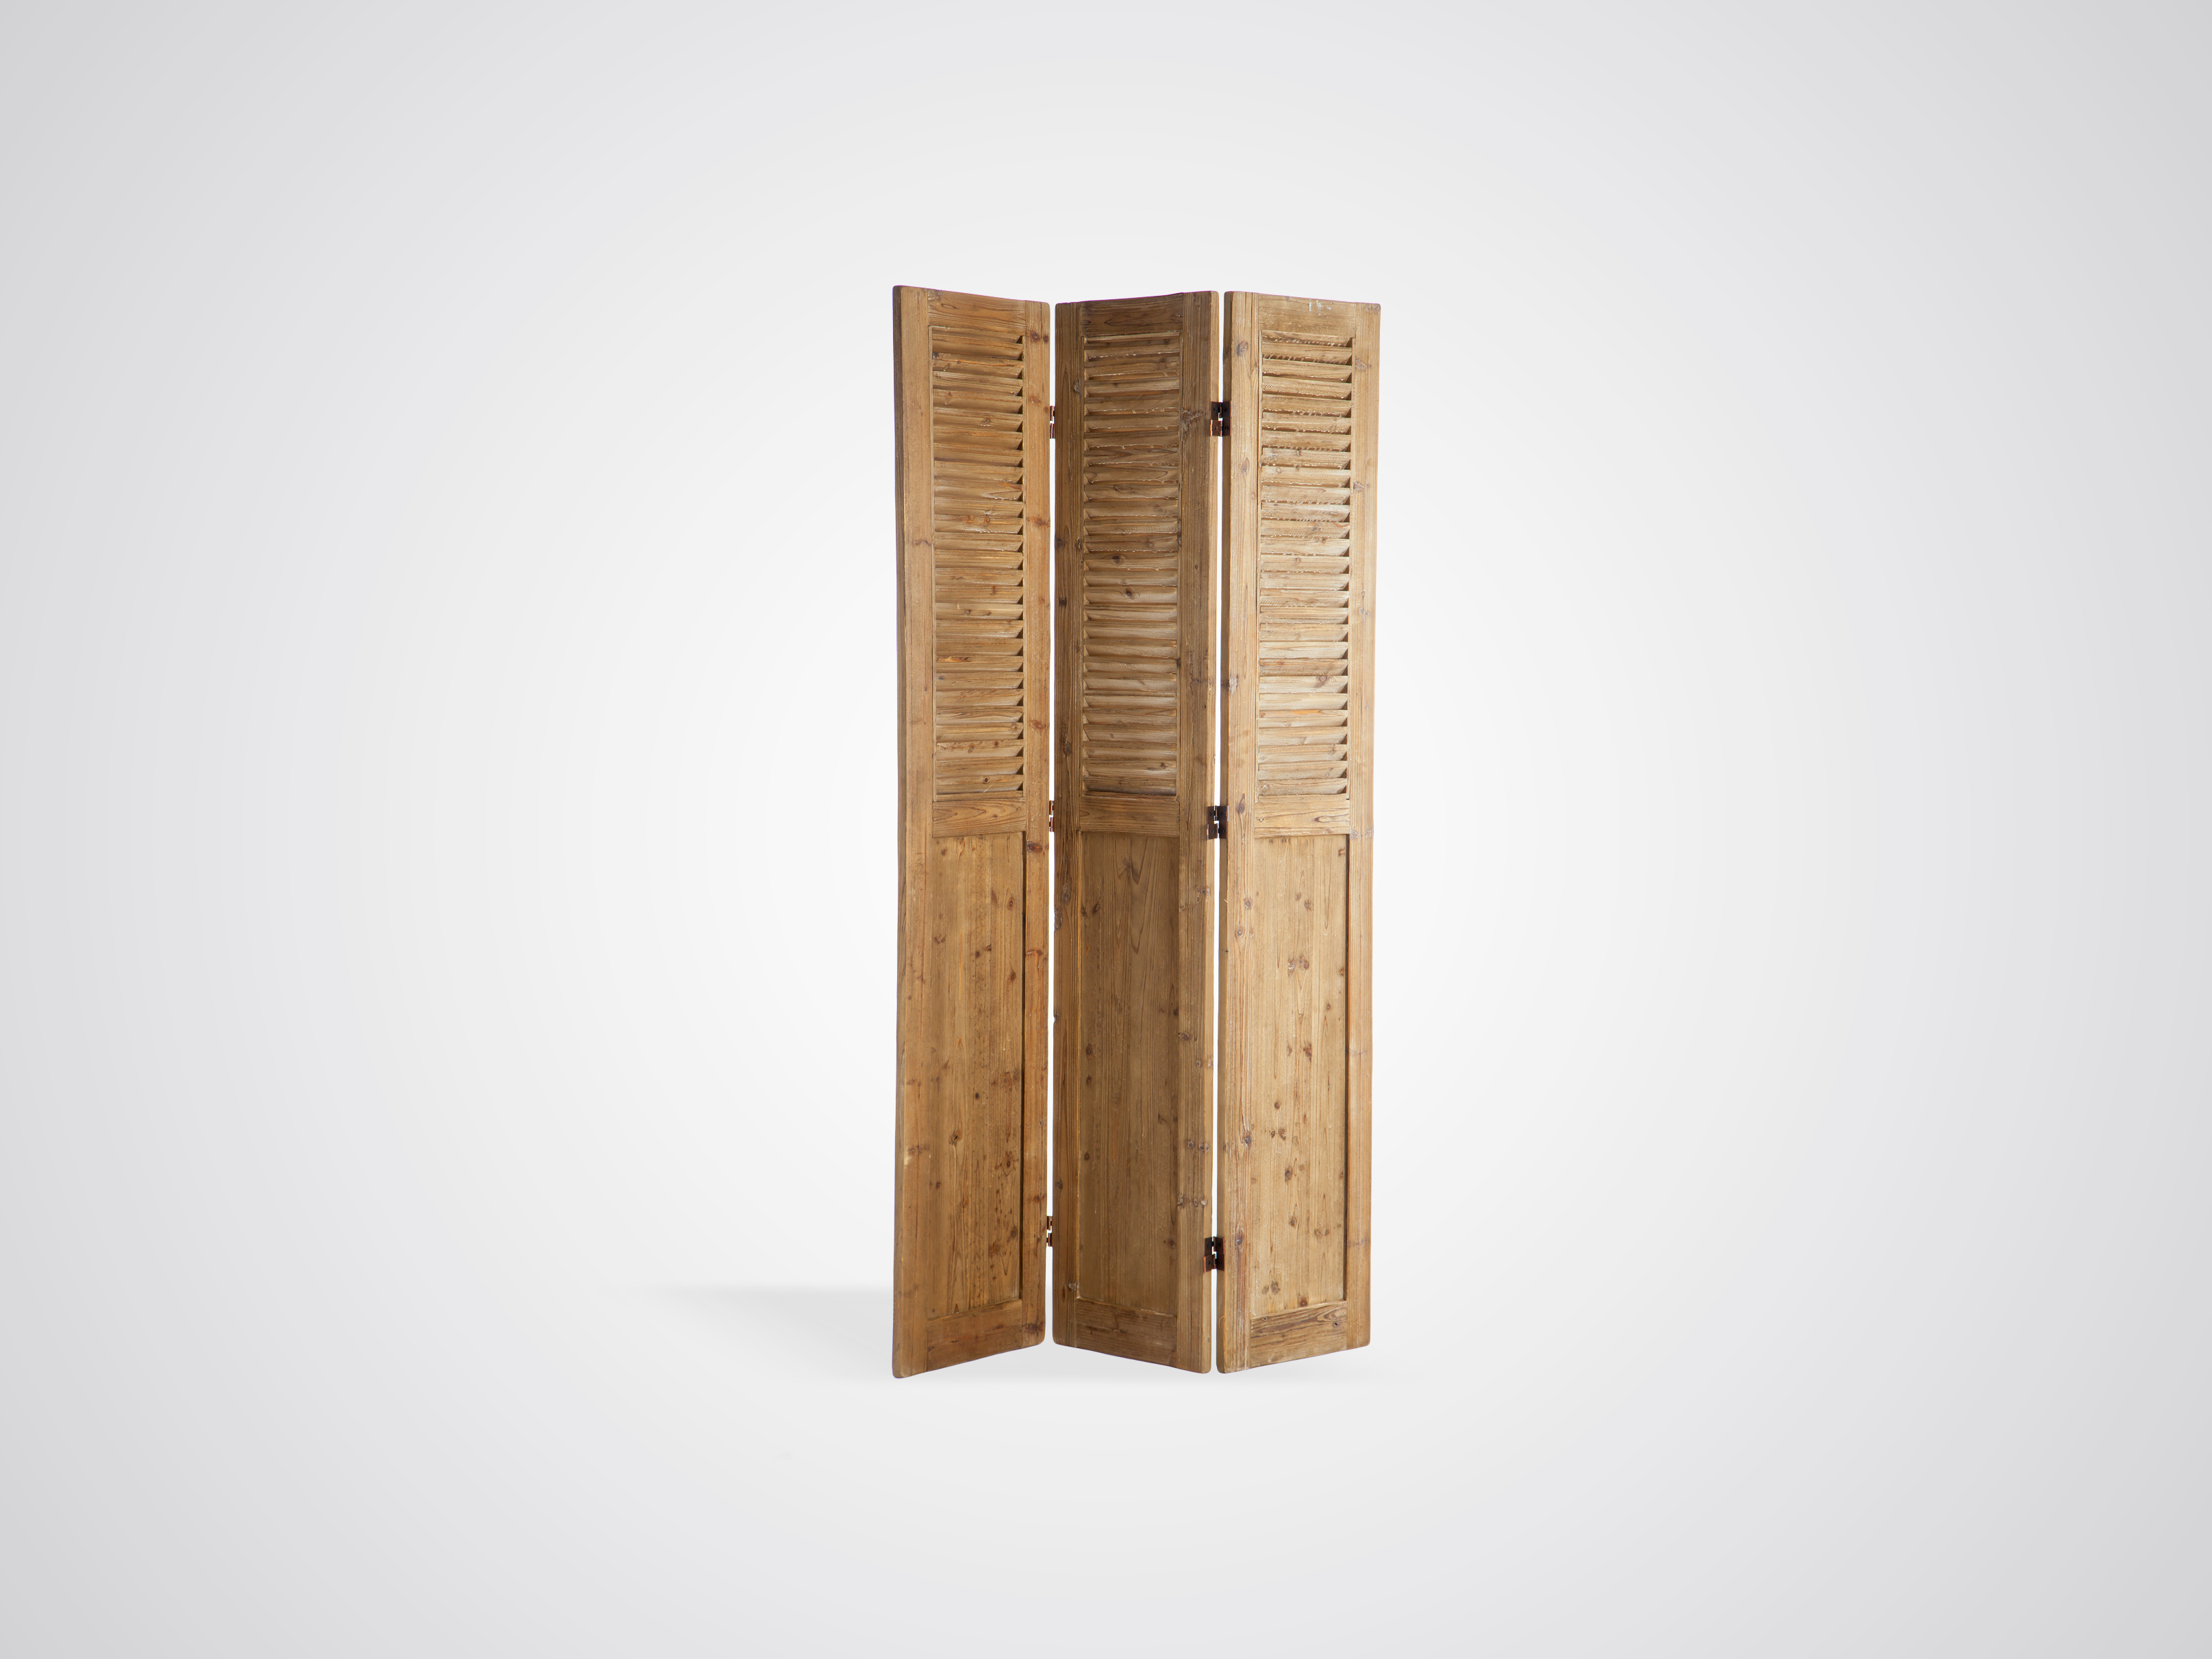 Ширма деревянная 210x120x3 см, inmyroom, Китай  - Купить